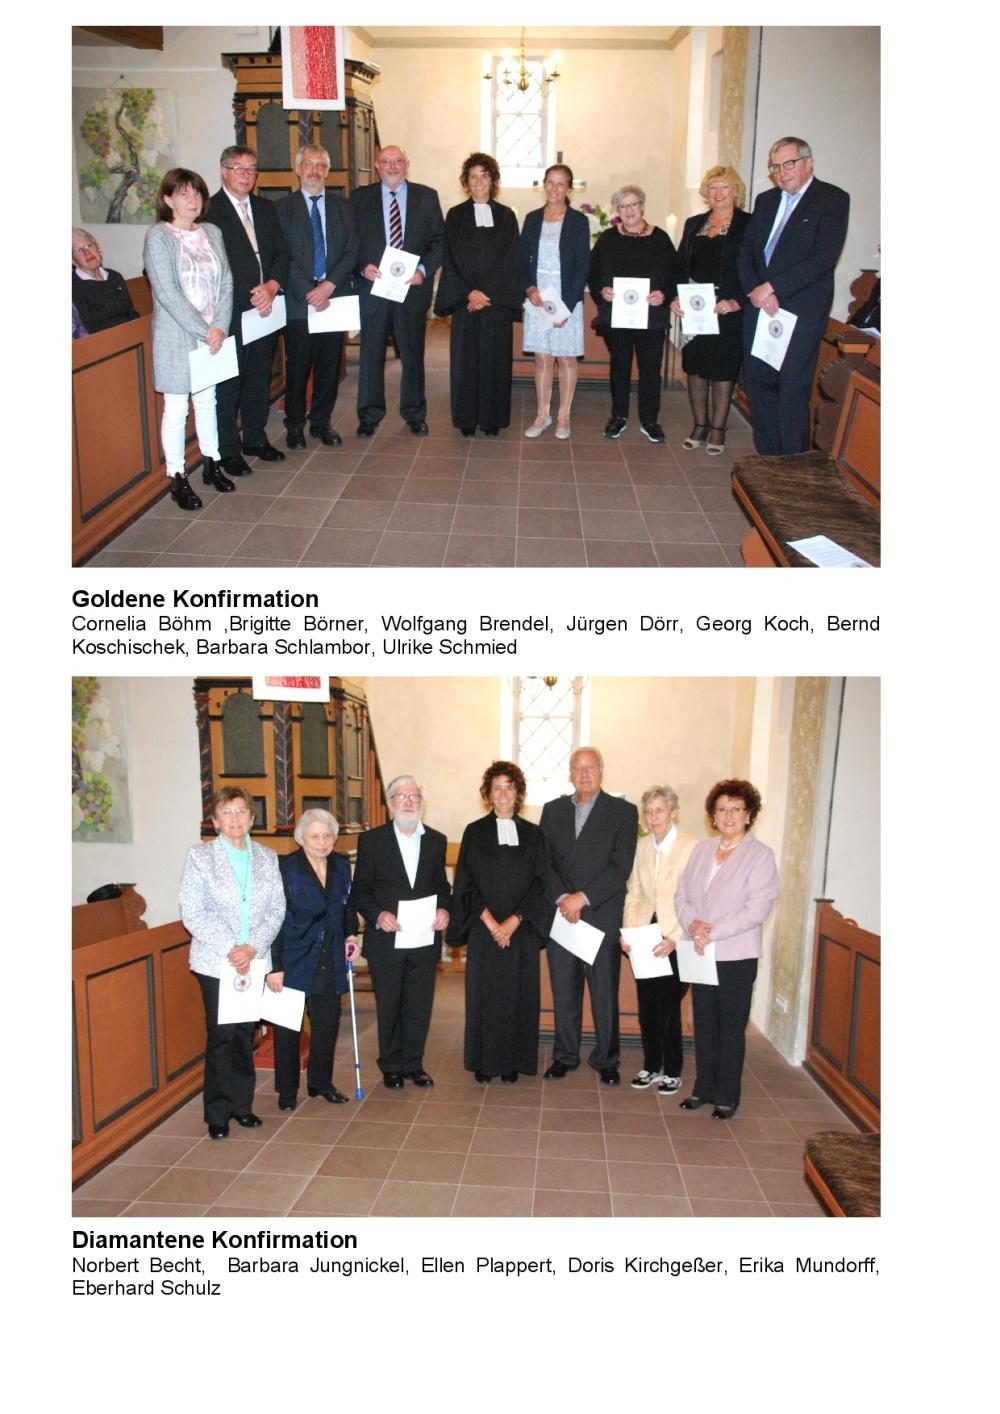 2017-05-07 Jubelkonfirmation in Auringen-002